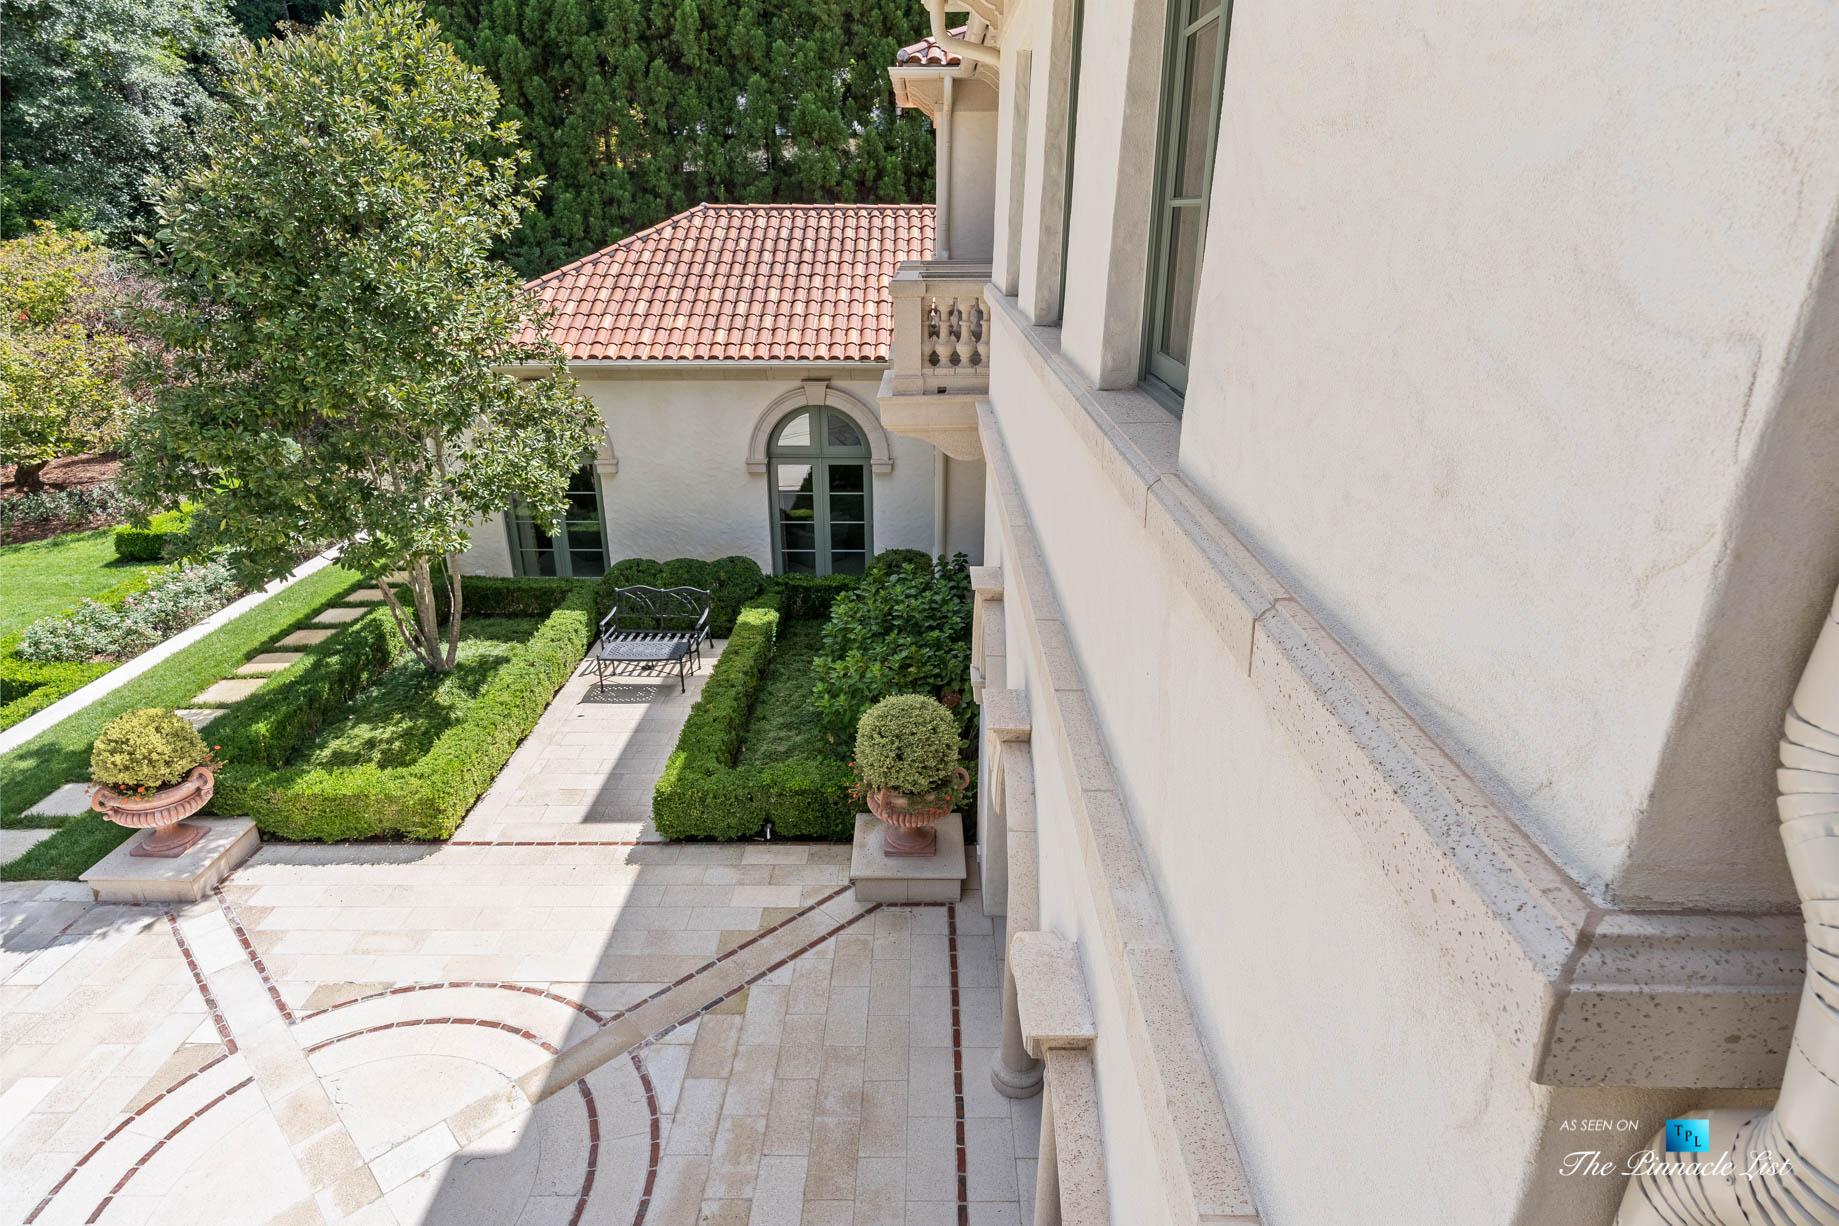 439 Blackland Rd NW, Atlanta, GA, USA – Private Backyard Deck – Luxury Real Estate – Tuxedo Park Mediterranean Mansion Home